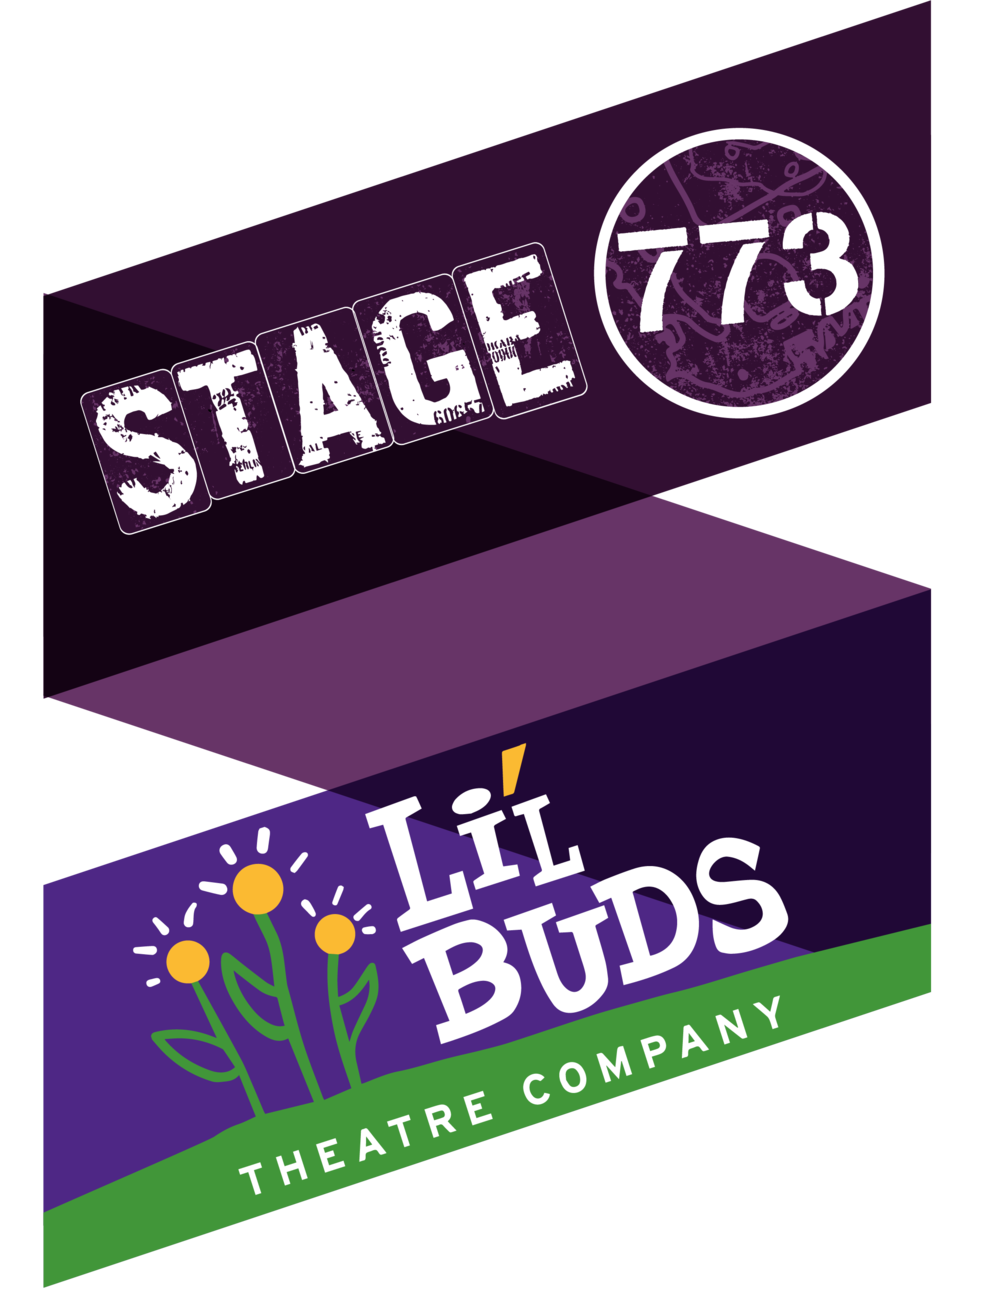 773_lilbuds_logo.png